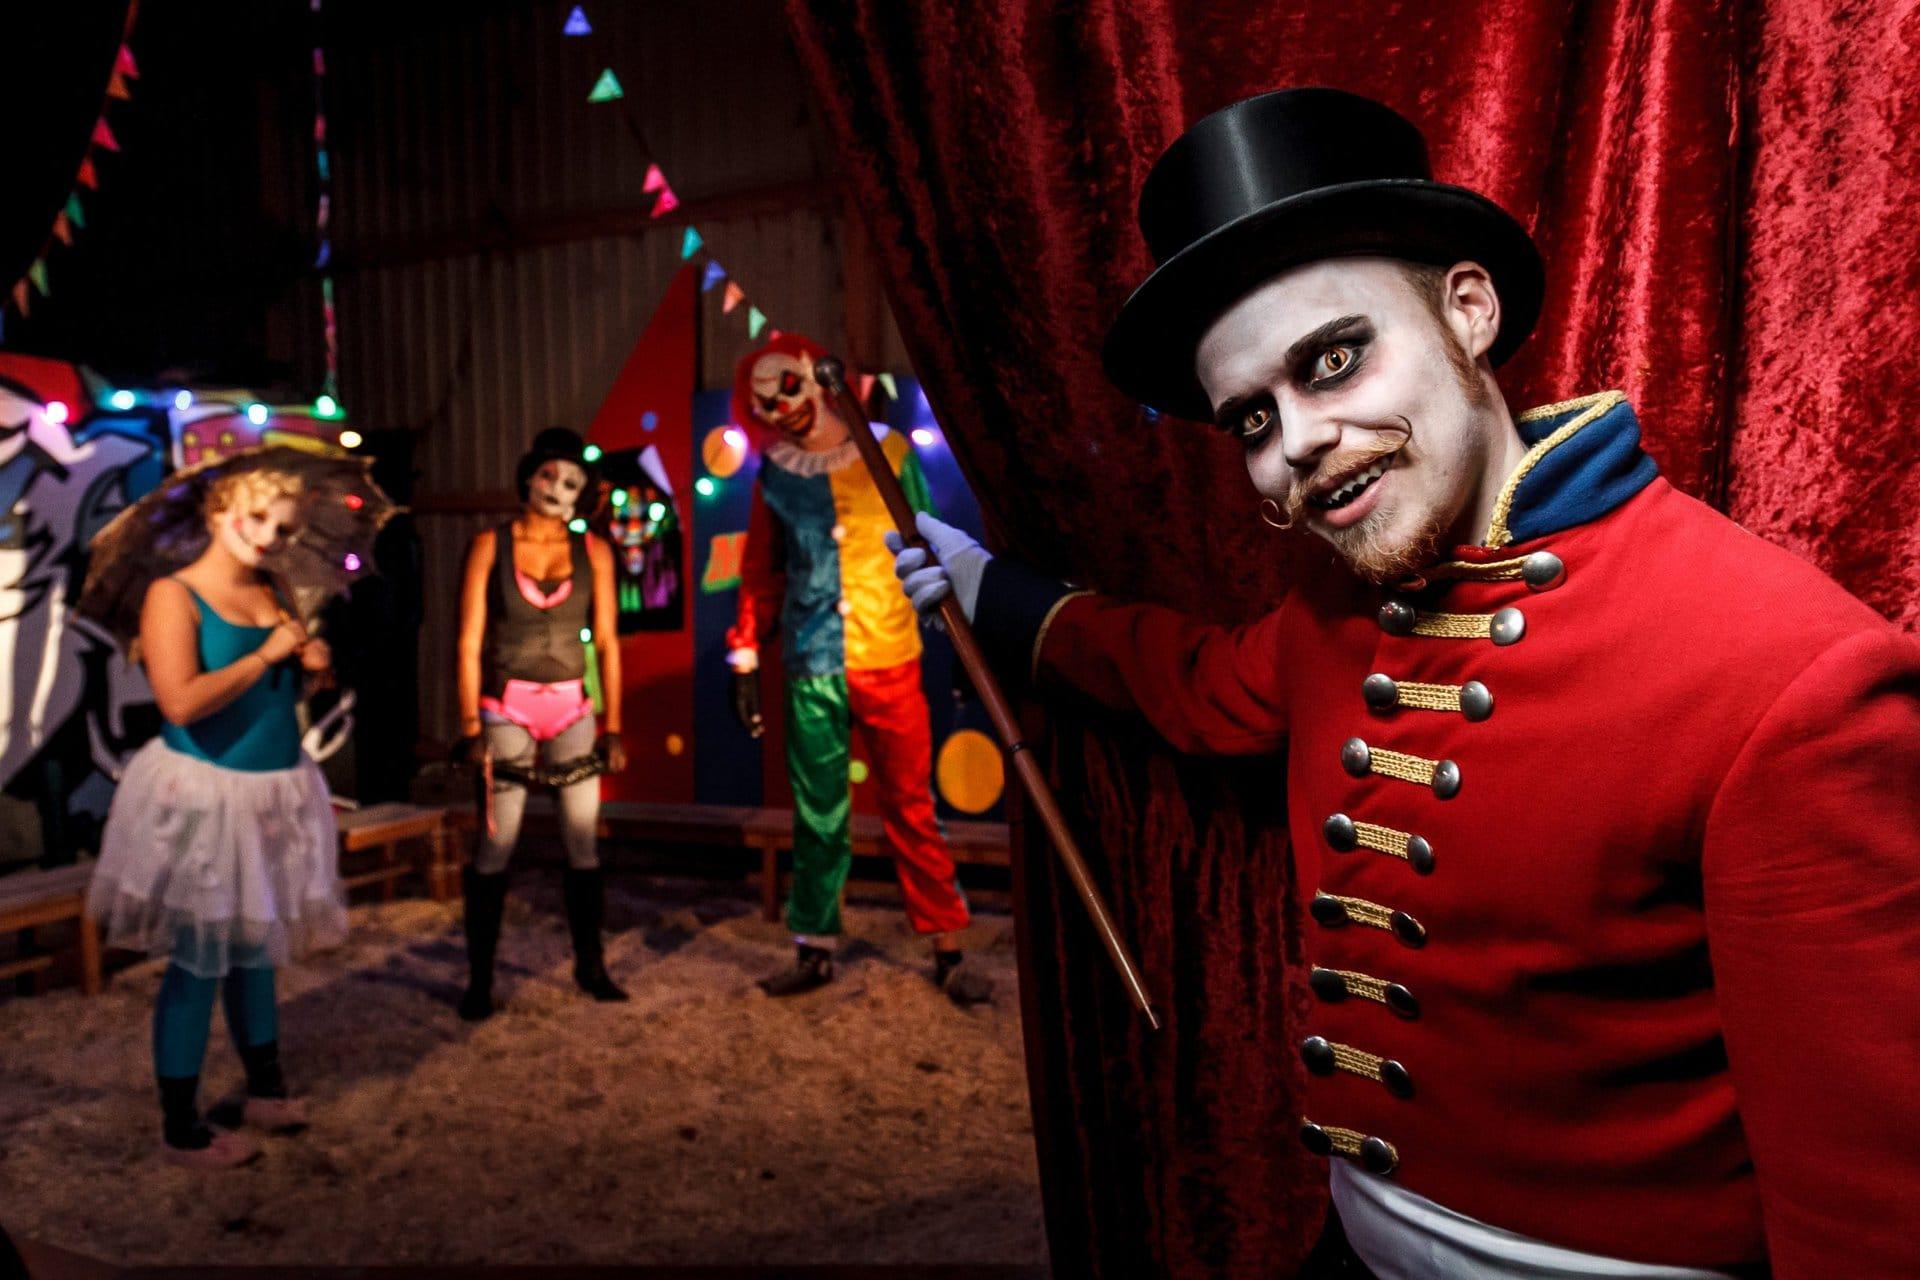 Cirkus DYSTOPIA Tivoli Friheden Halloween